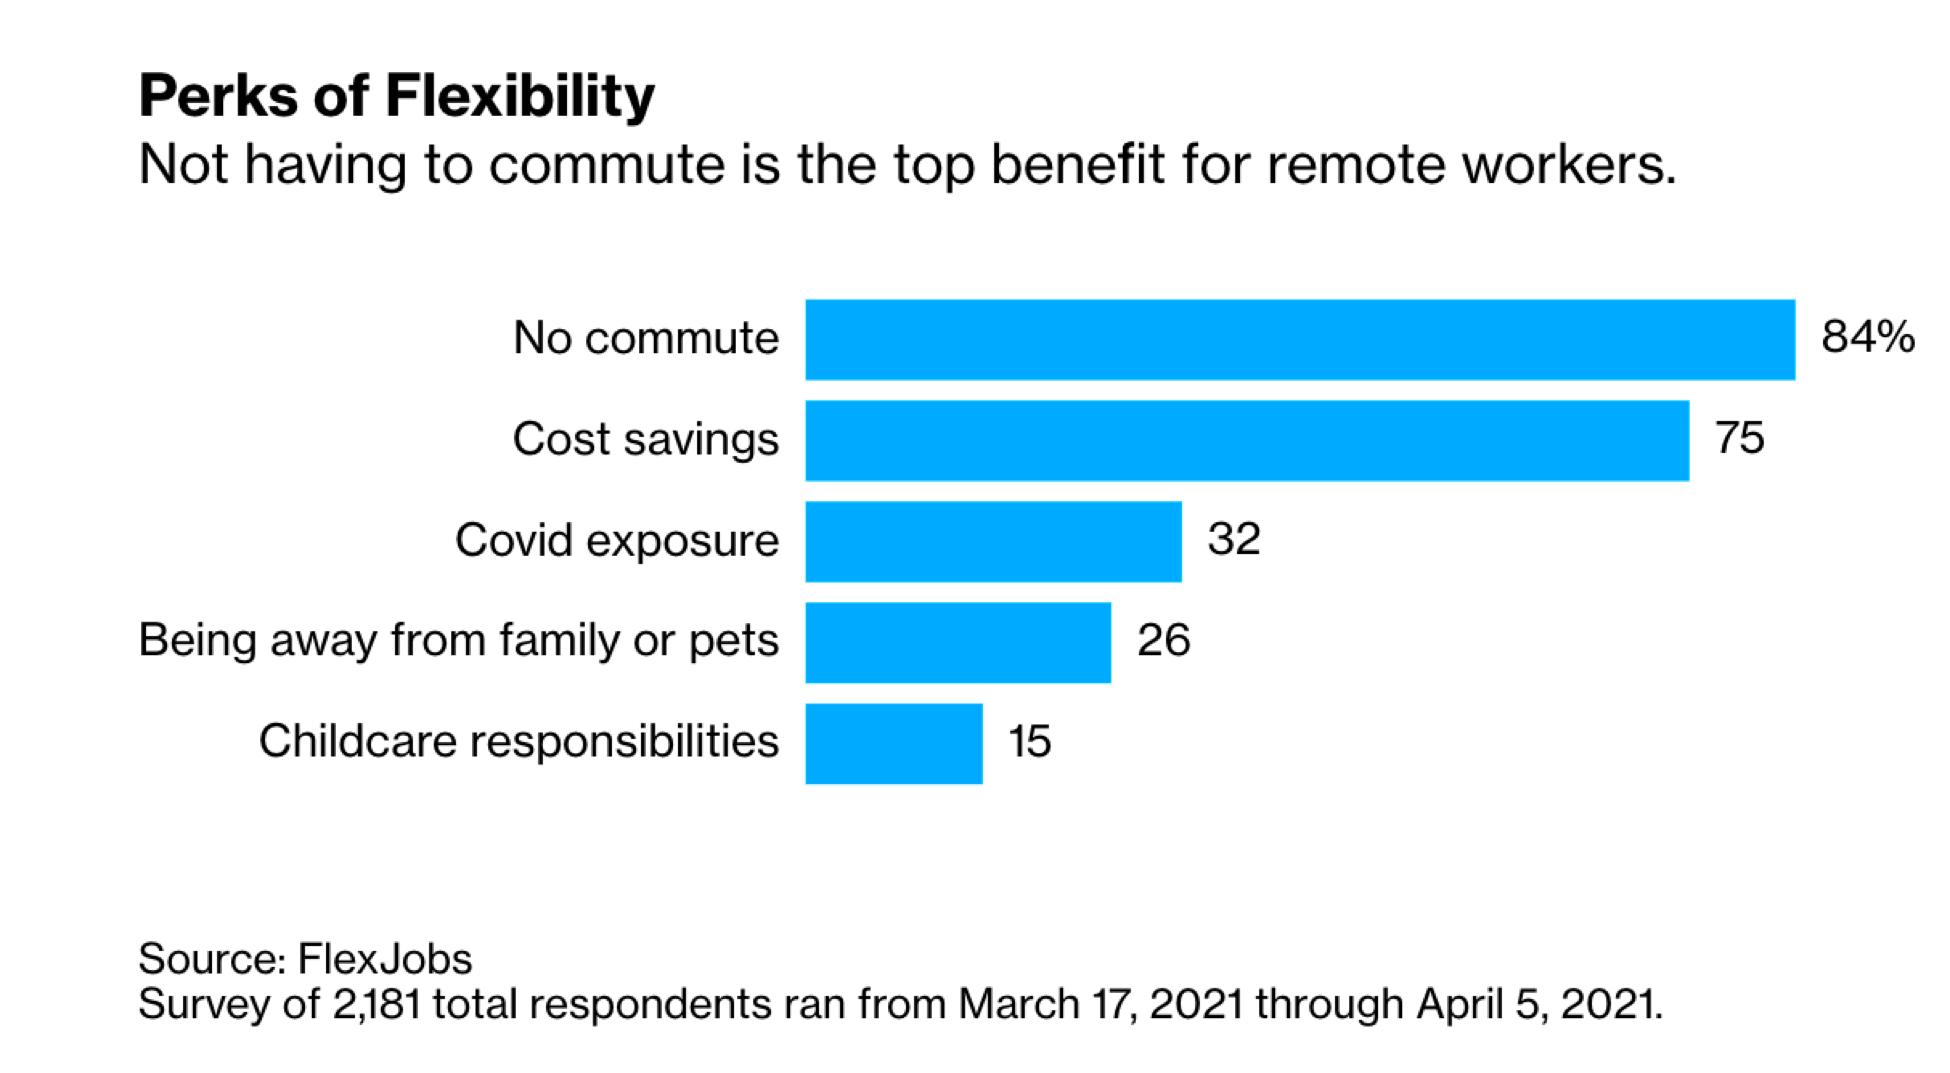 Perks of Flexibility Chart